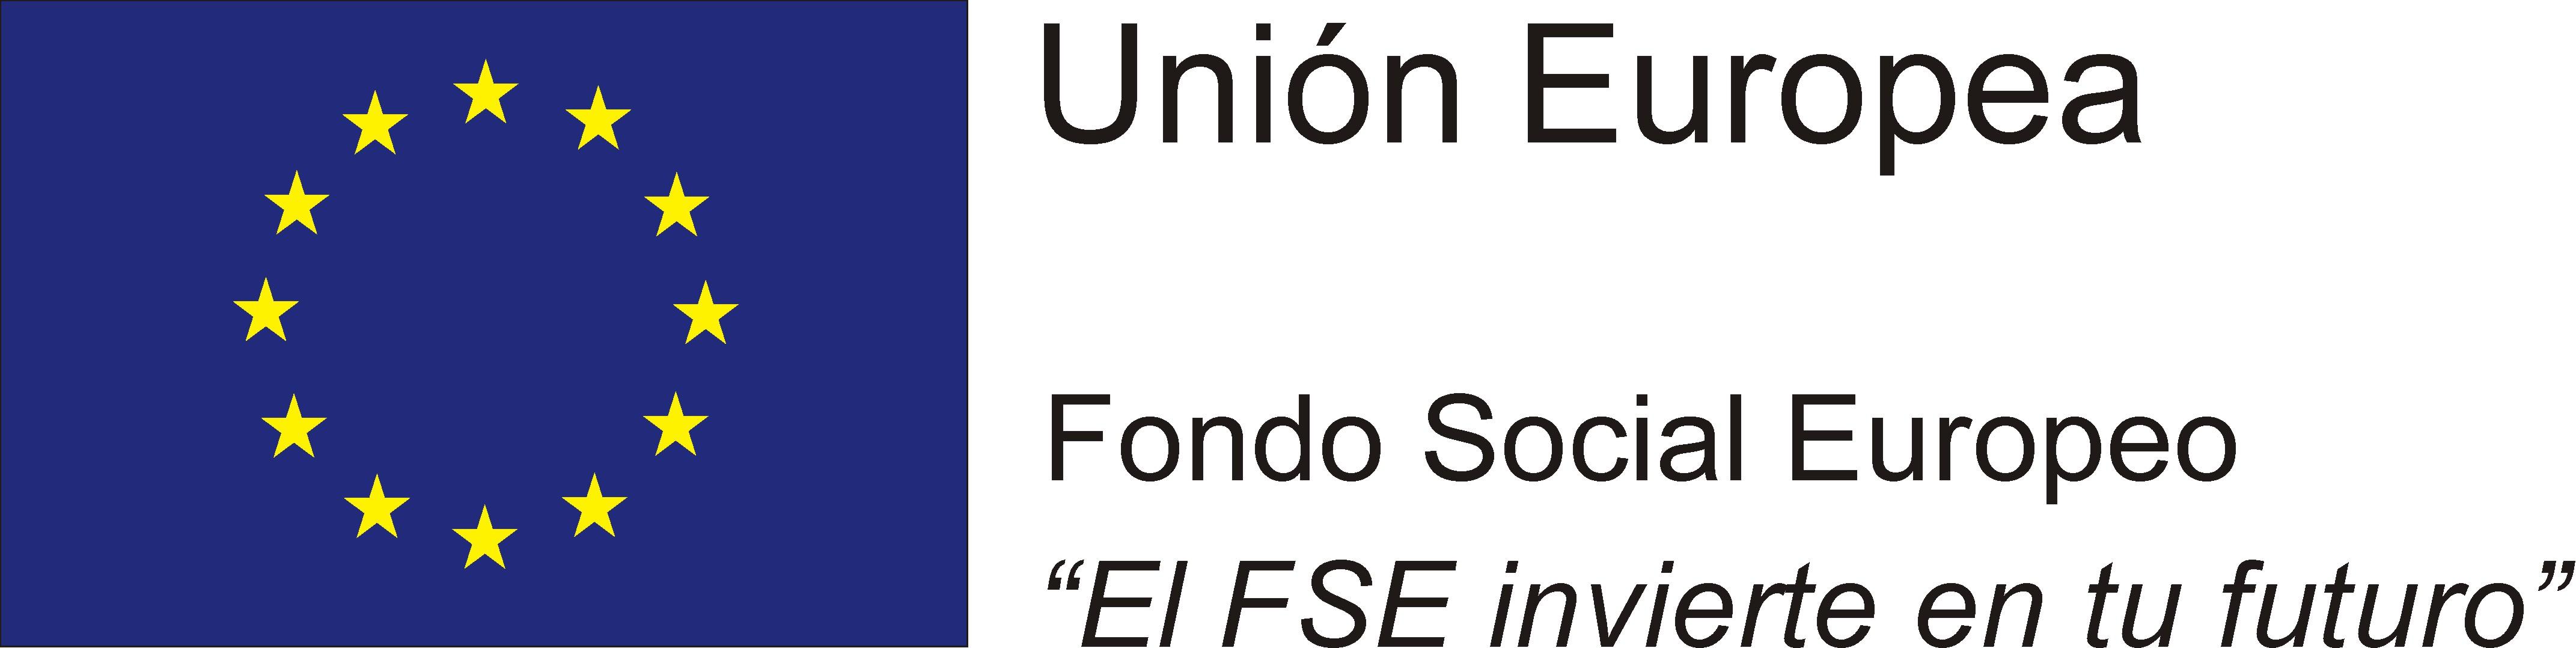 Fondo Social Europeo apaisado (FSE_horizontal_izda_color_(PANTONE).jpg)